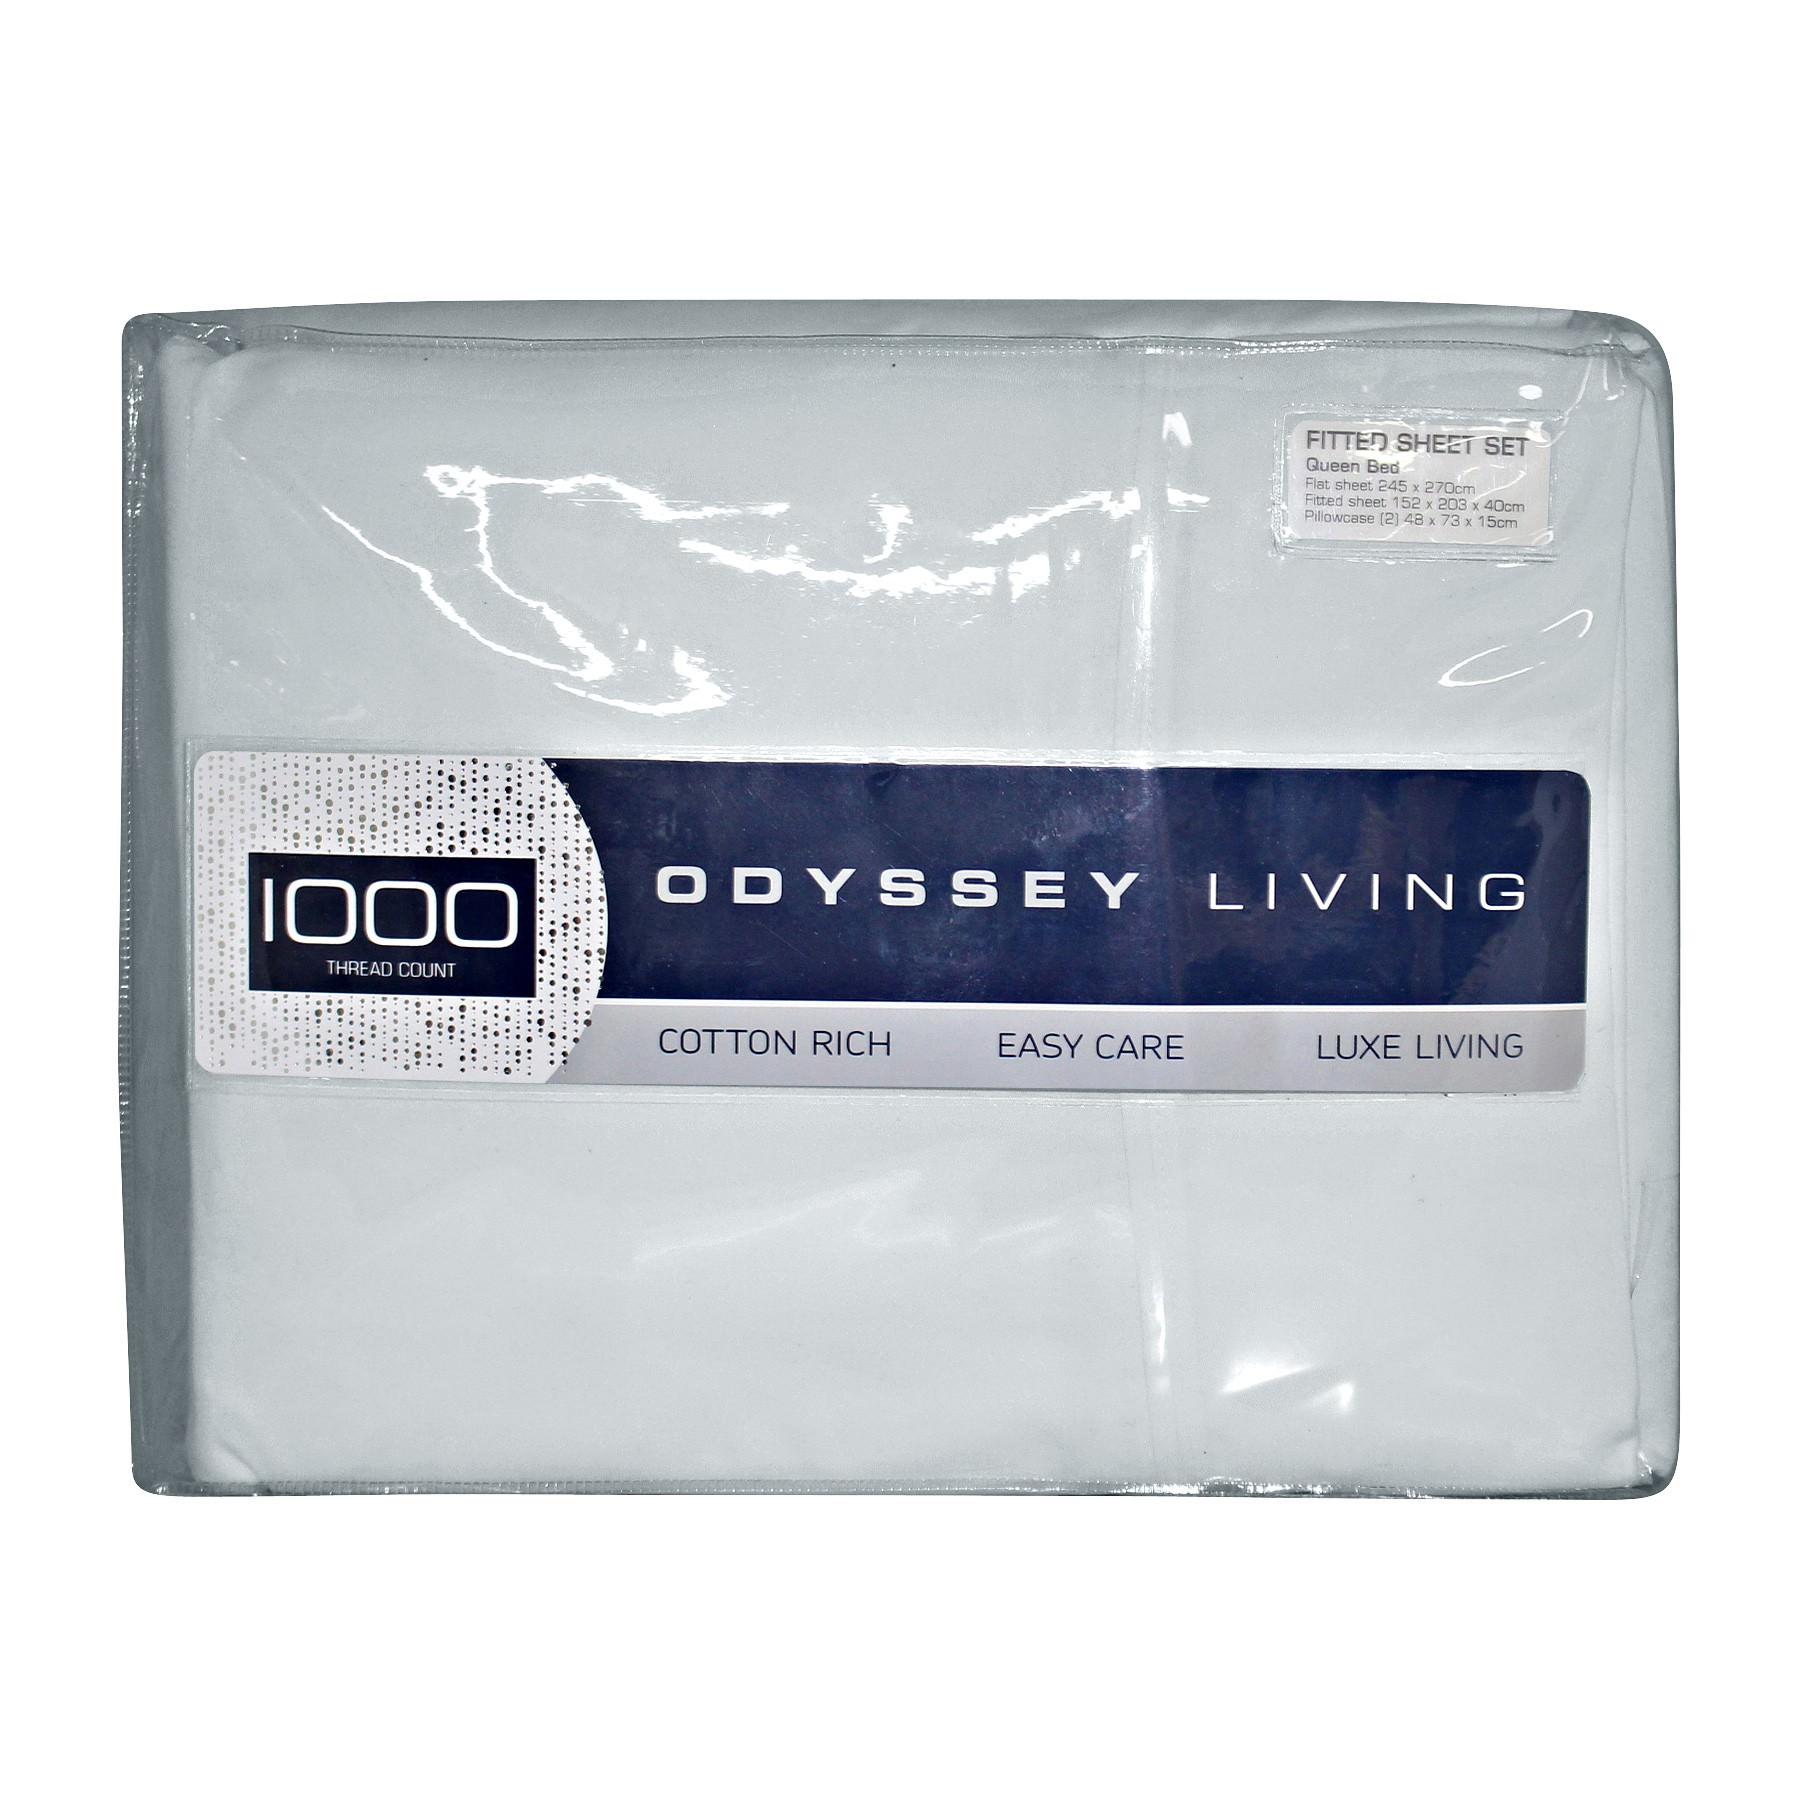 Odyssey Living 1000TC Cotton Rich Sheet Set, Double, Silver